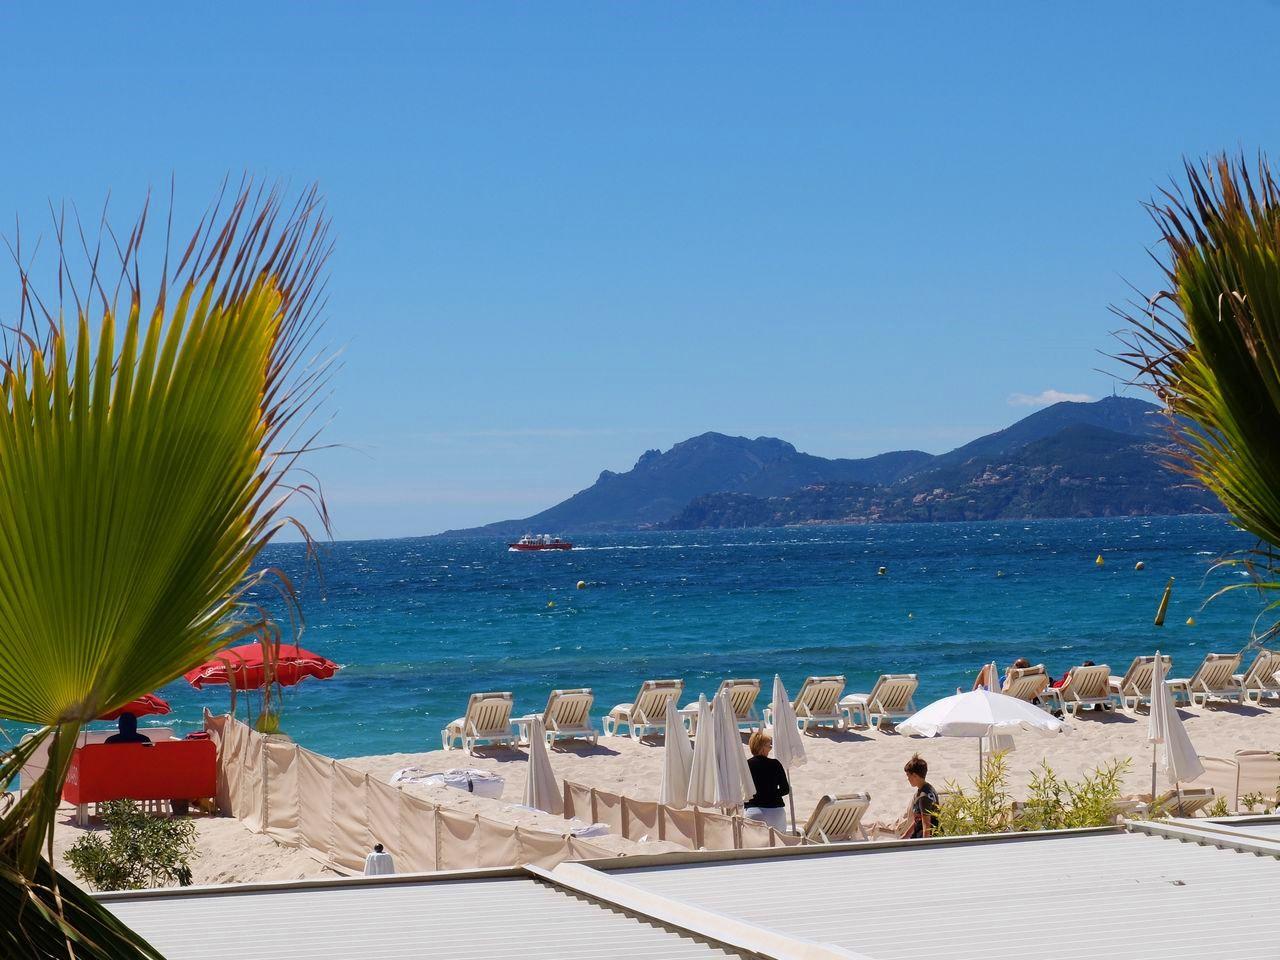 Die Croisette -  Die wohl berühmteste Strandpromenade der Côte d'Azur